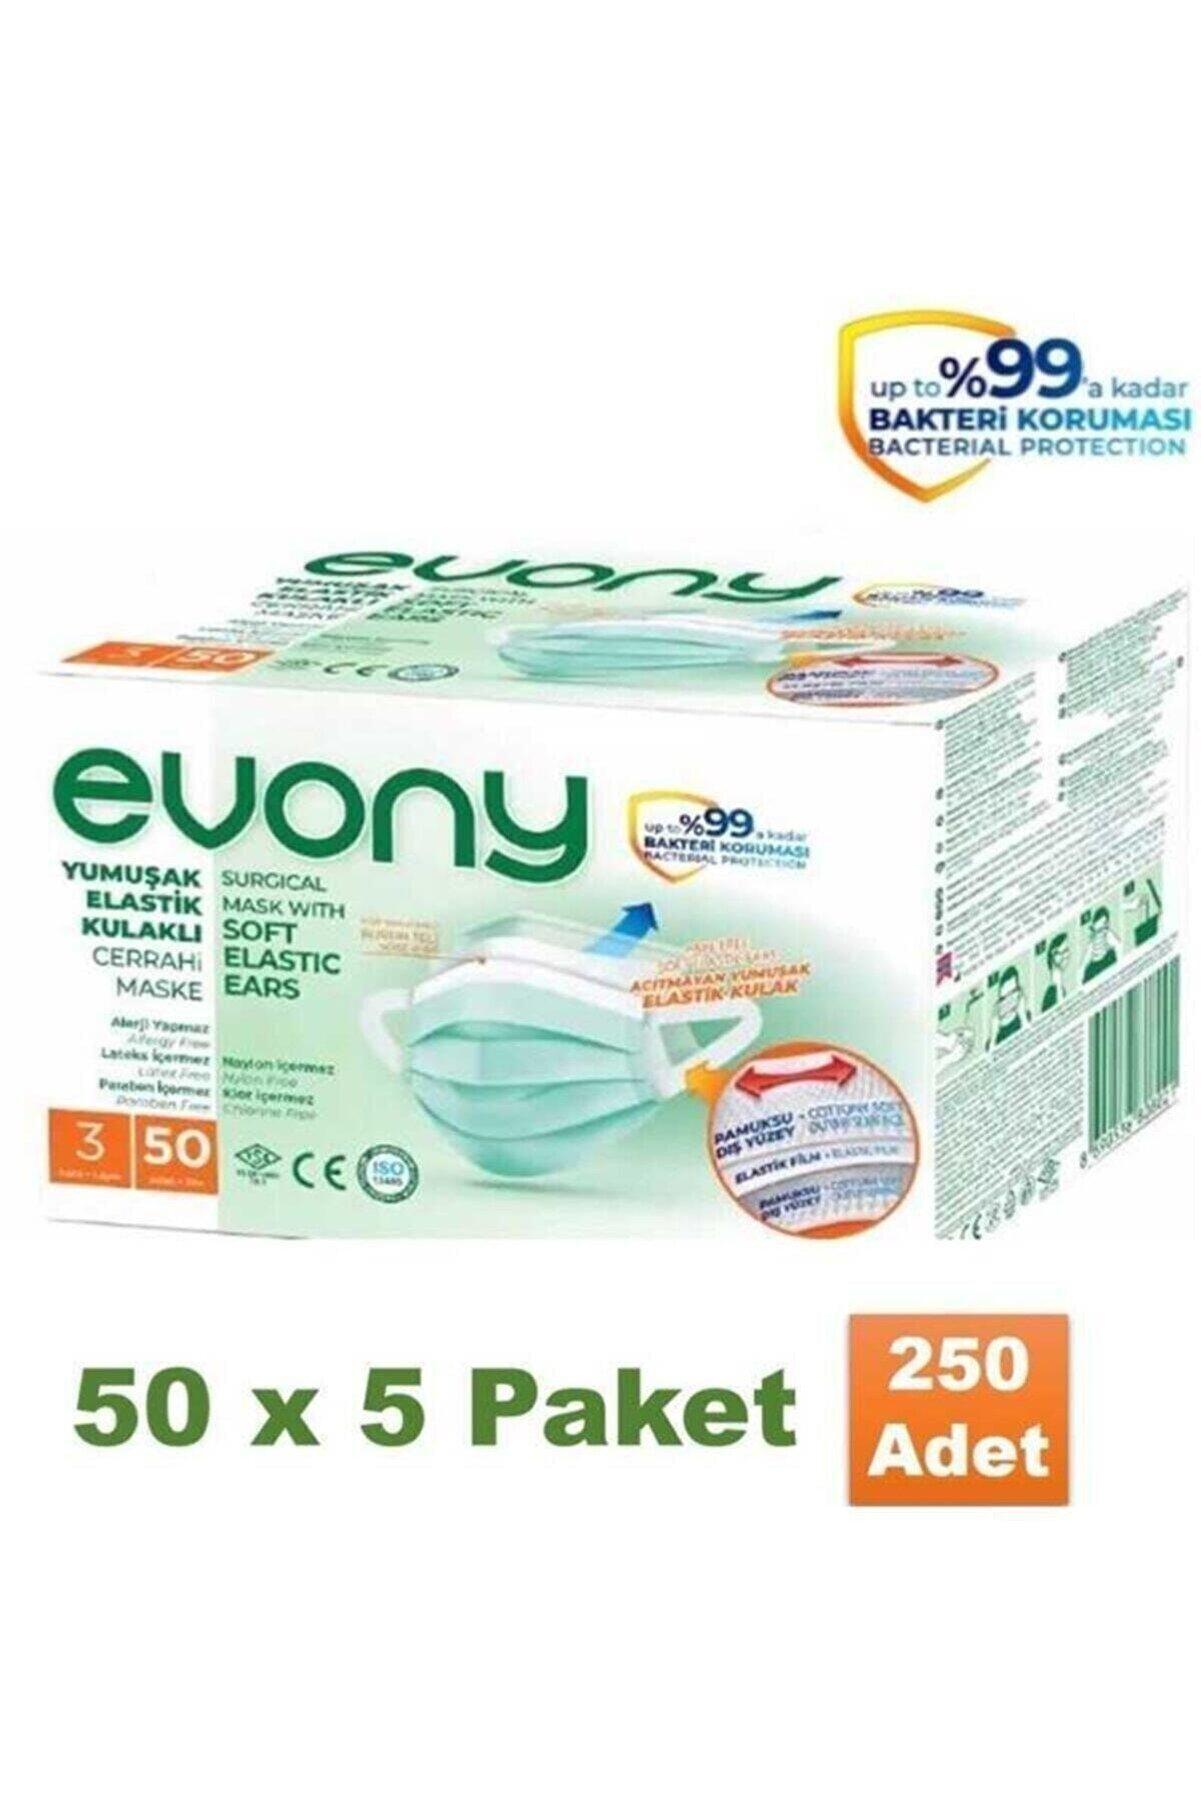 Evony 3 Katlı Cerrahi Maske 50 Li 5 Paket ( 250 Adet )